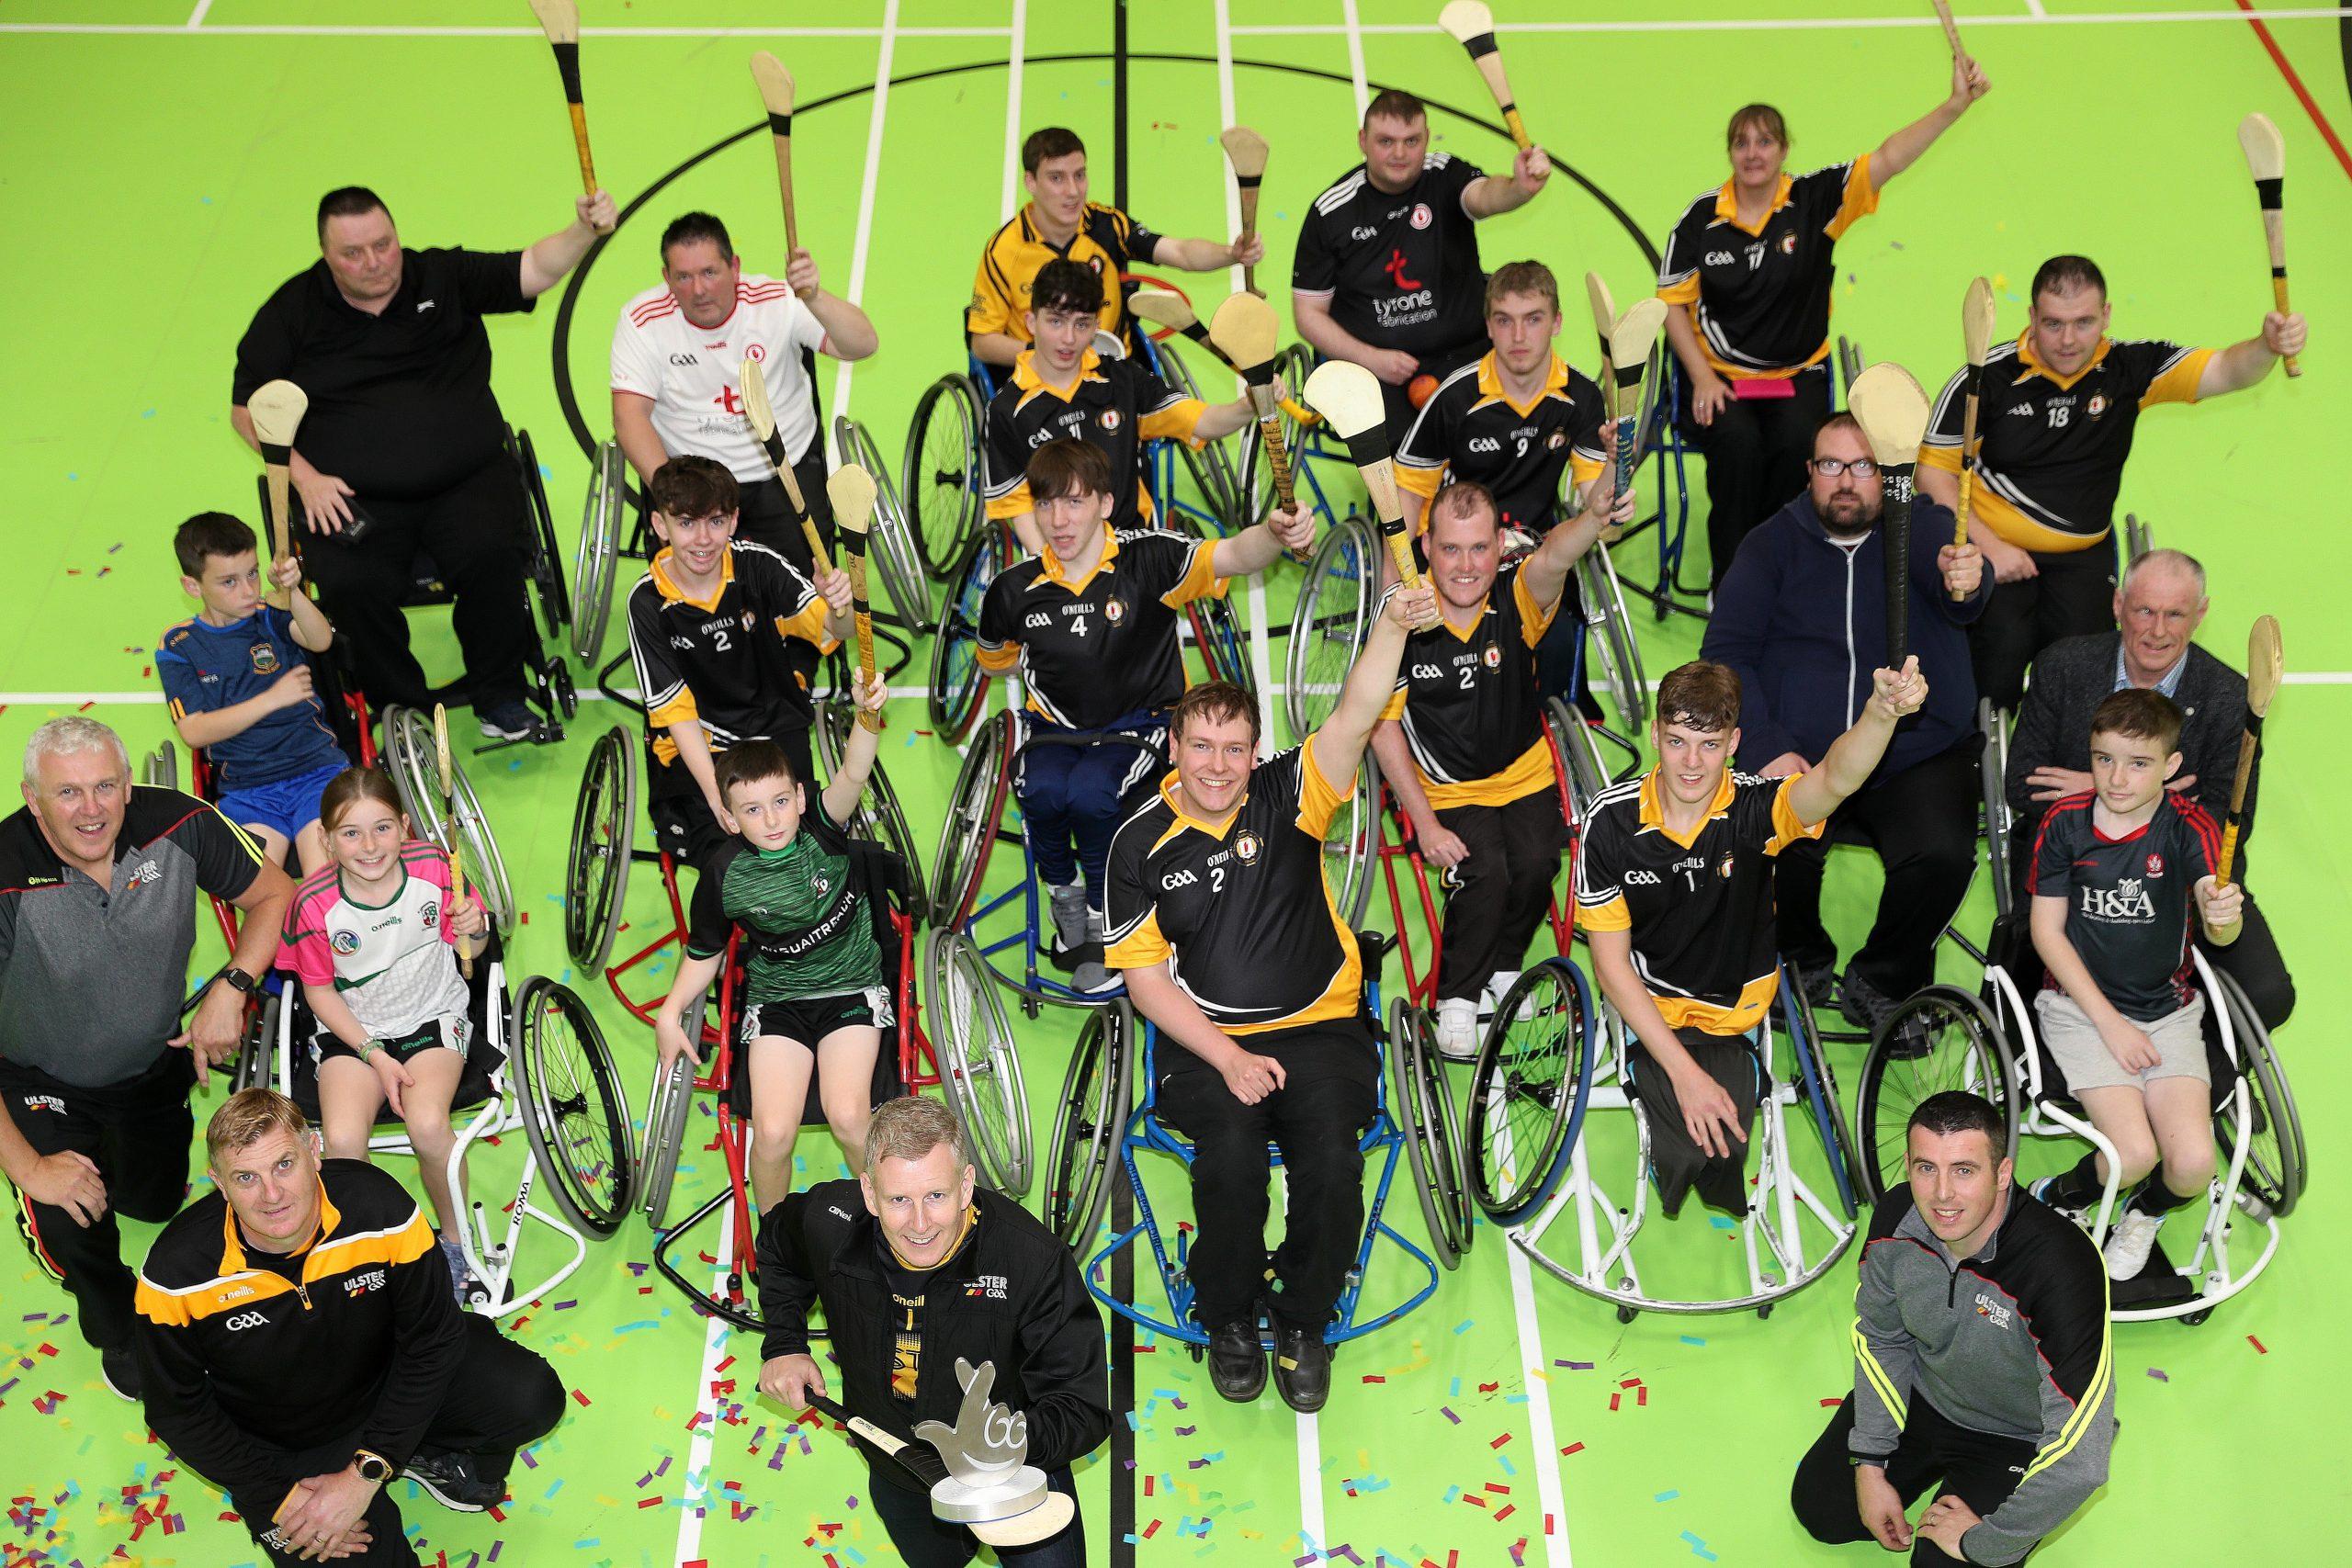 Kielty crowns Wheelchair Hurlers Awards Champions